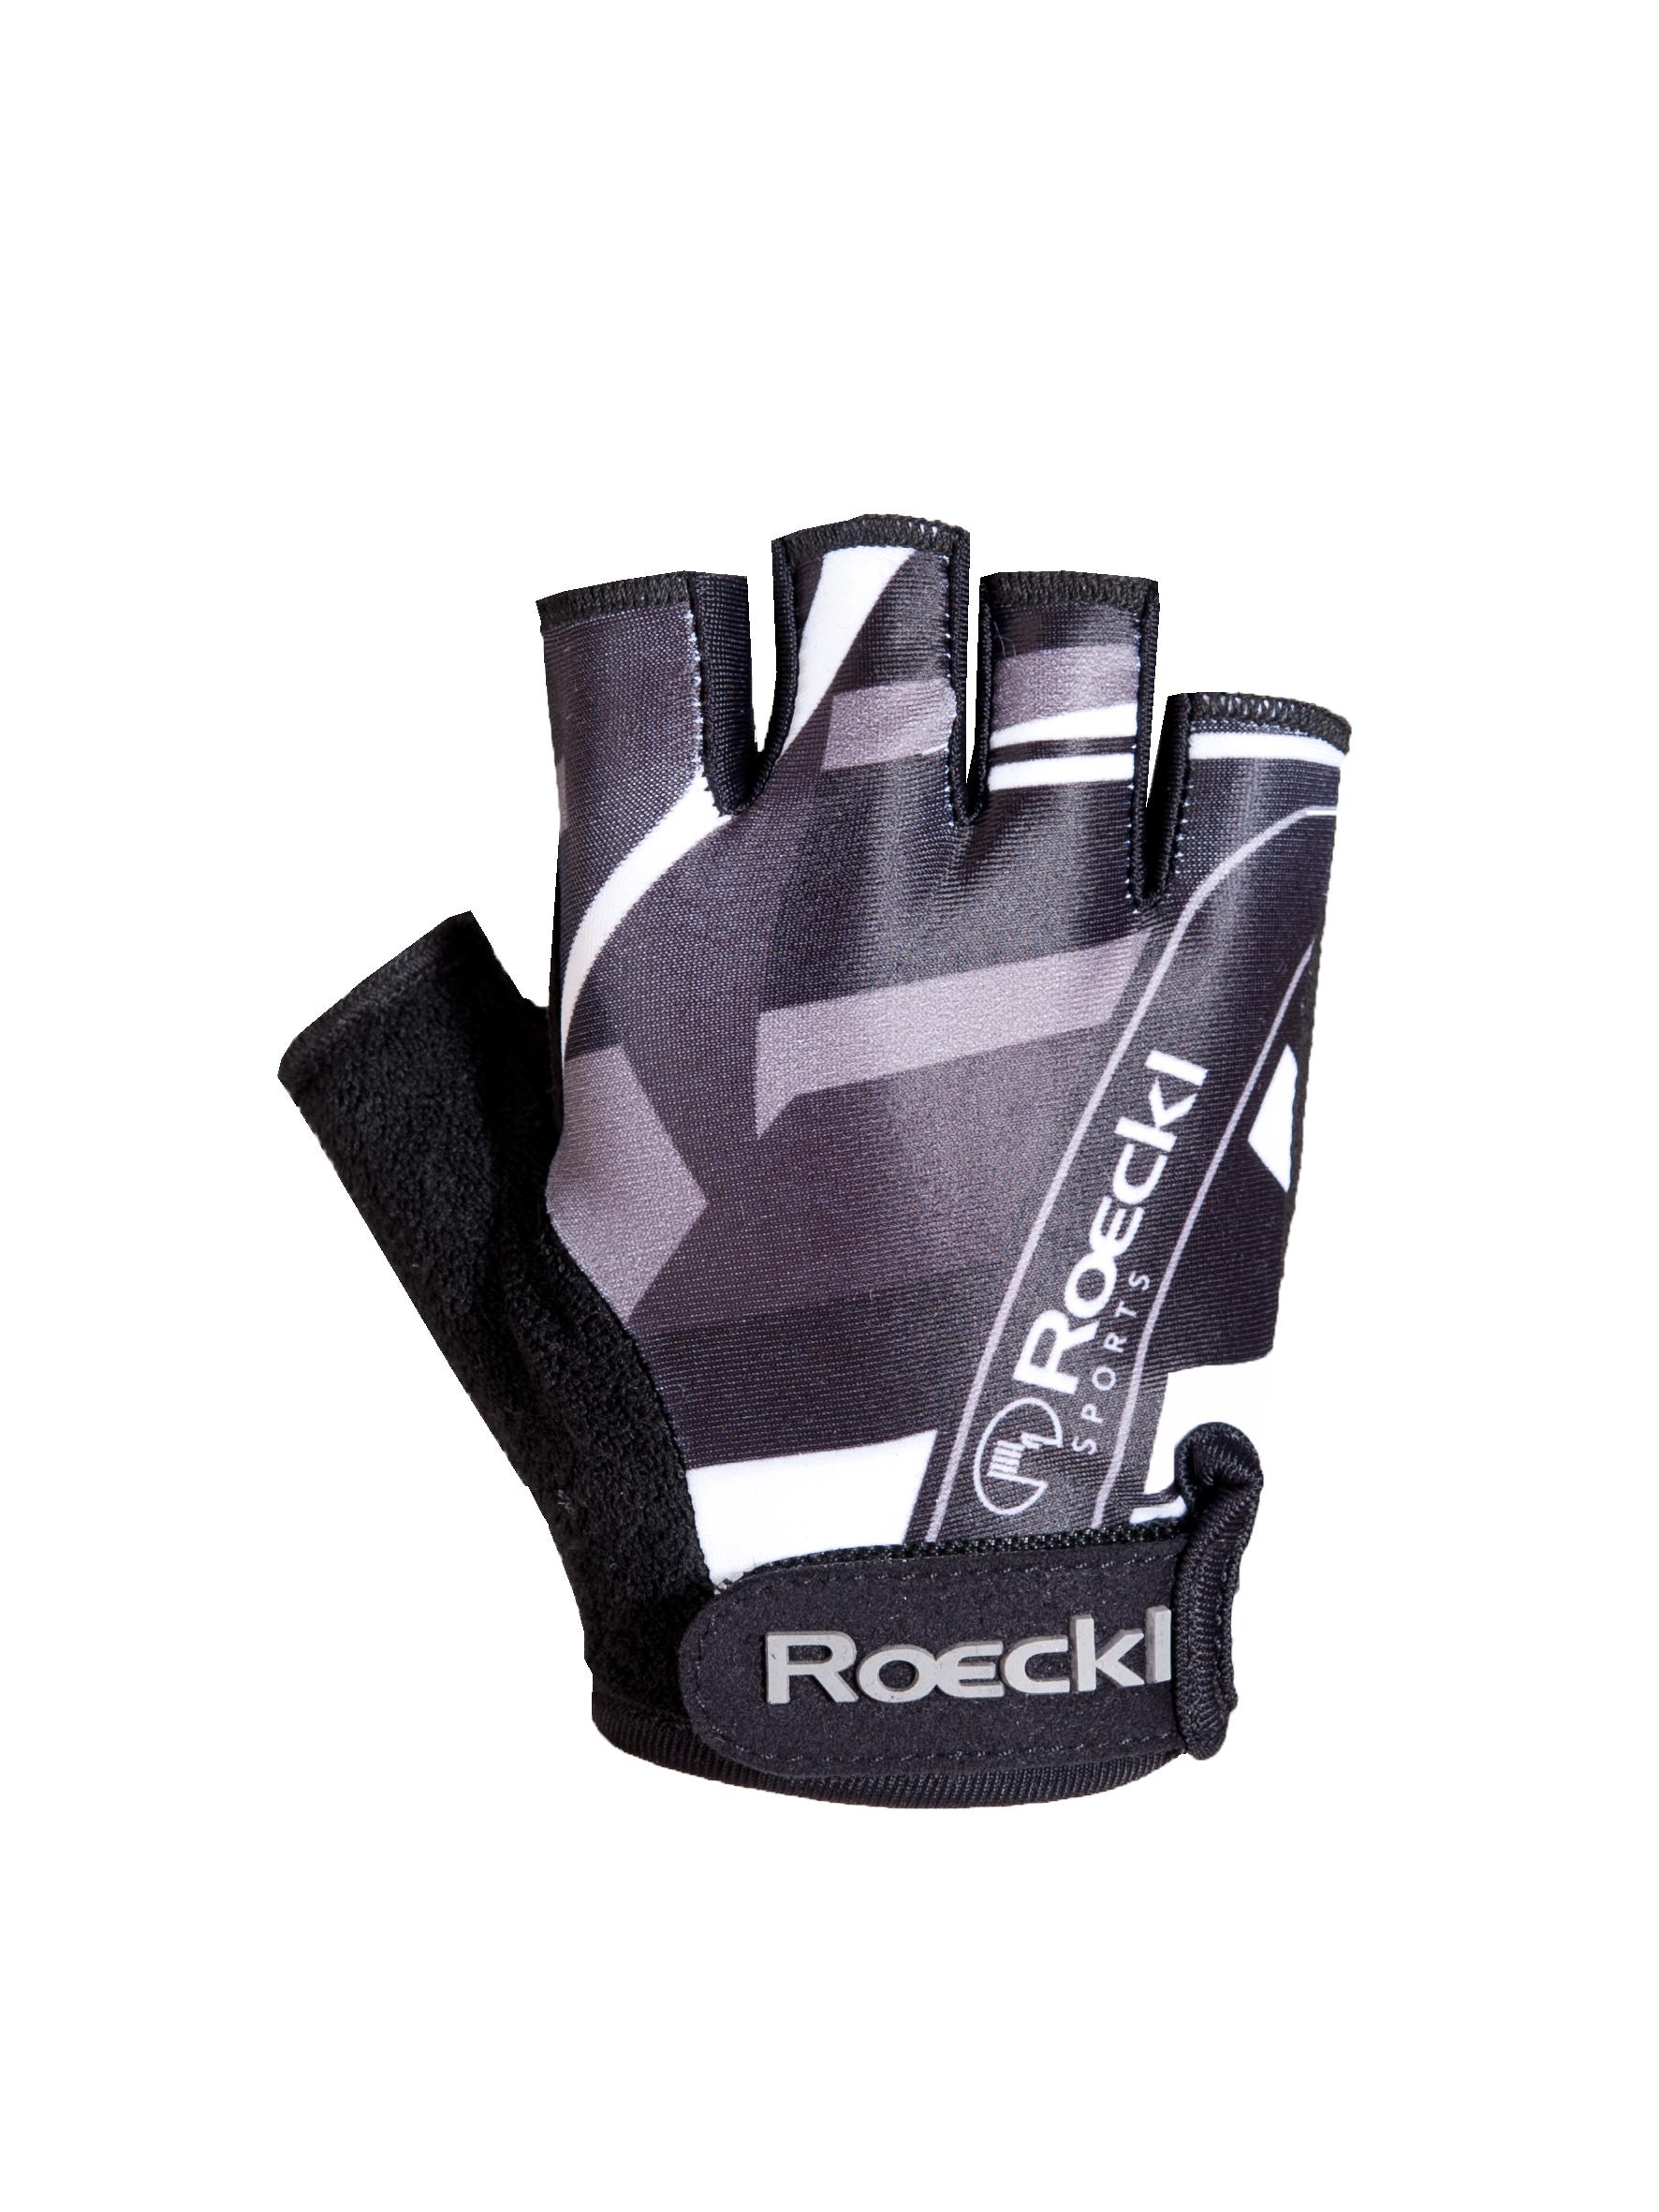 roeckl trava kinder fahrrad handschuhe kurz schwarz 2014. Black Bedroom Furniture Sets. Home Design Ideas